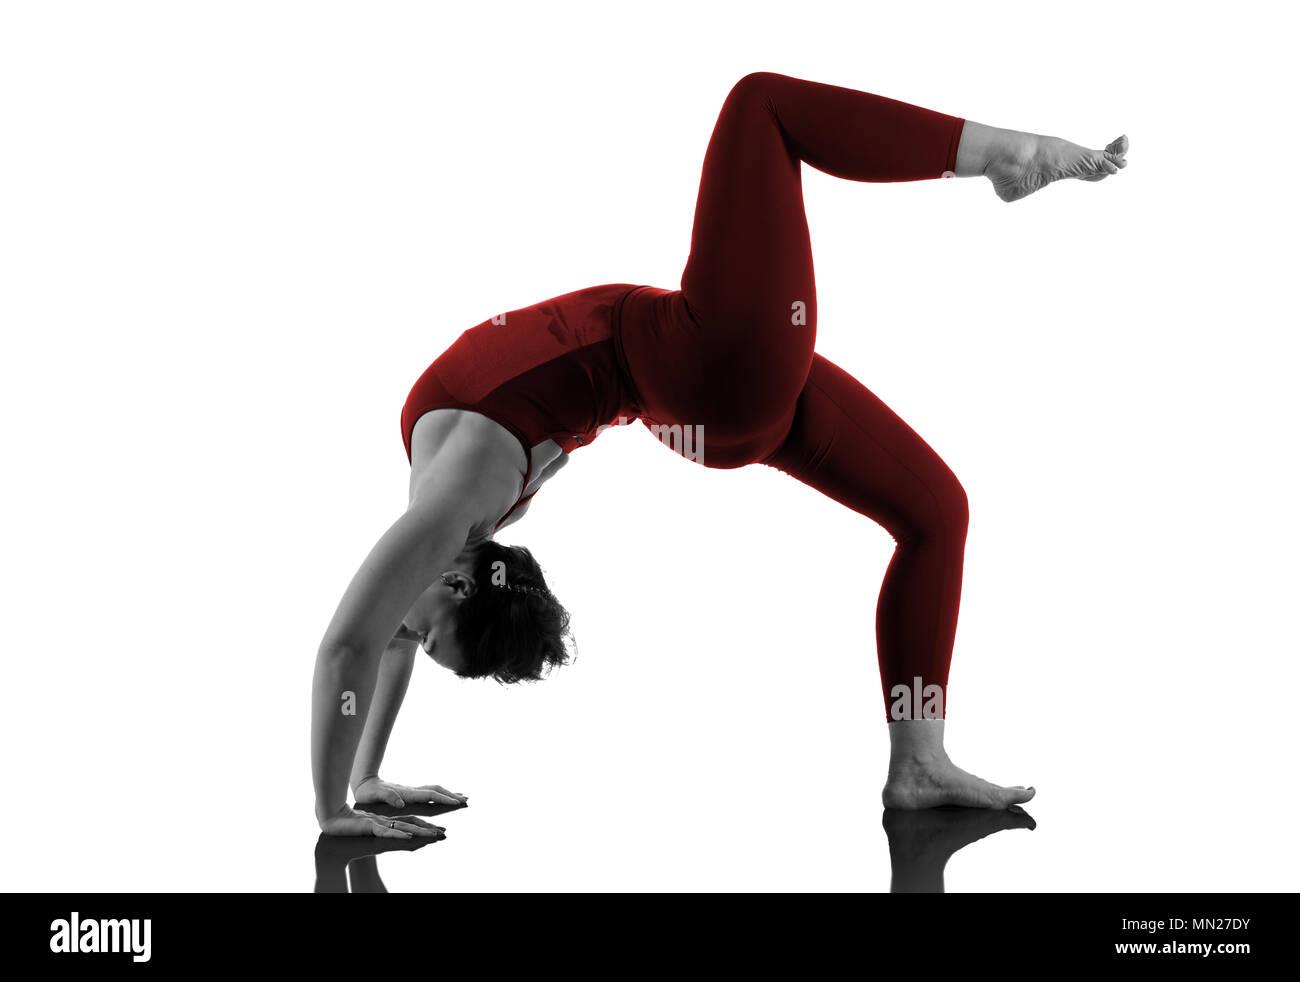 Woman In Urdhva Dhanurasana Yoga Pose on white - Stock Image